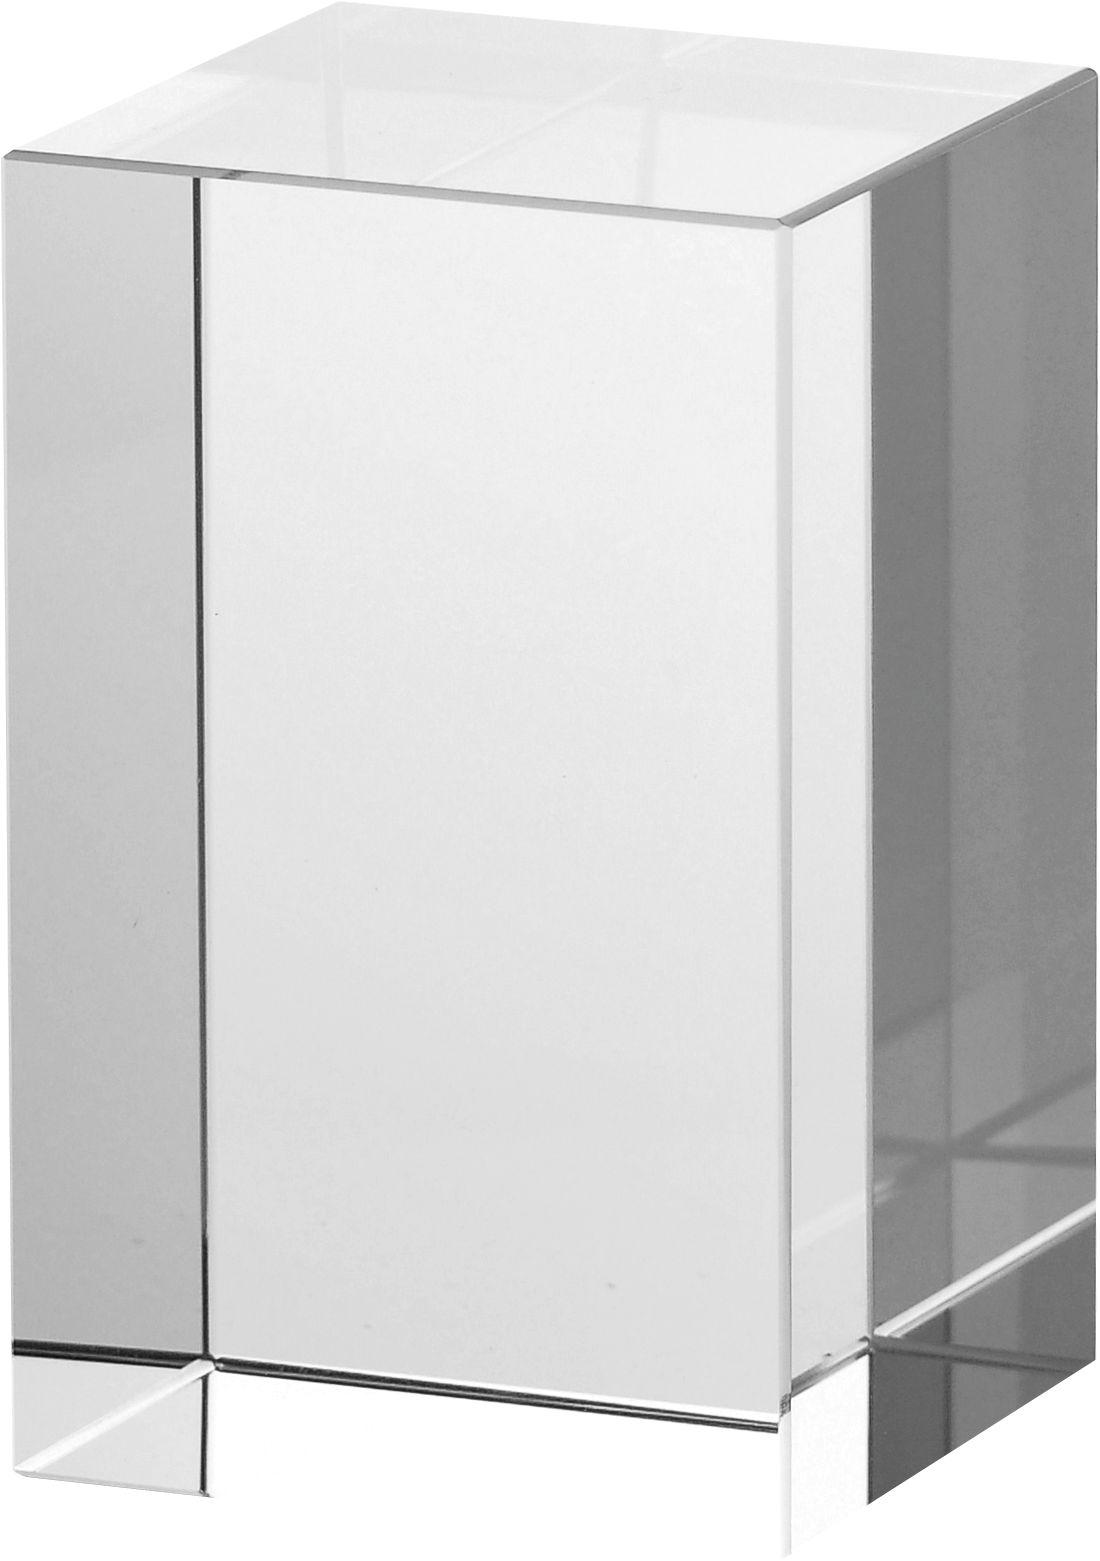 Szklana statuetka KR5080